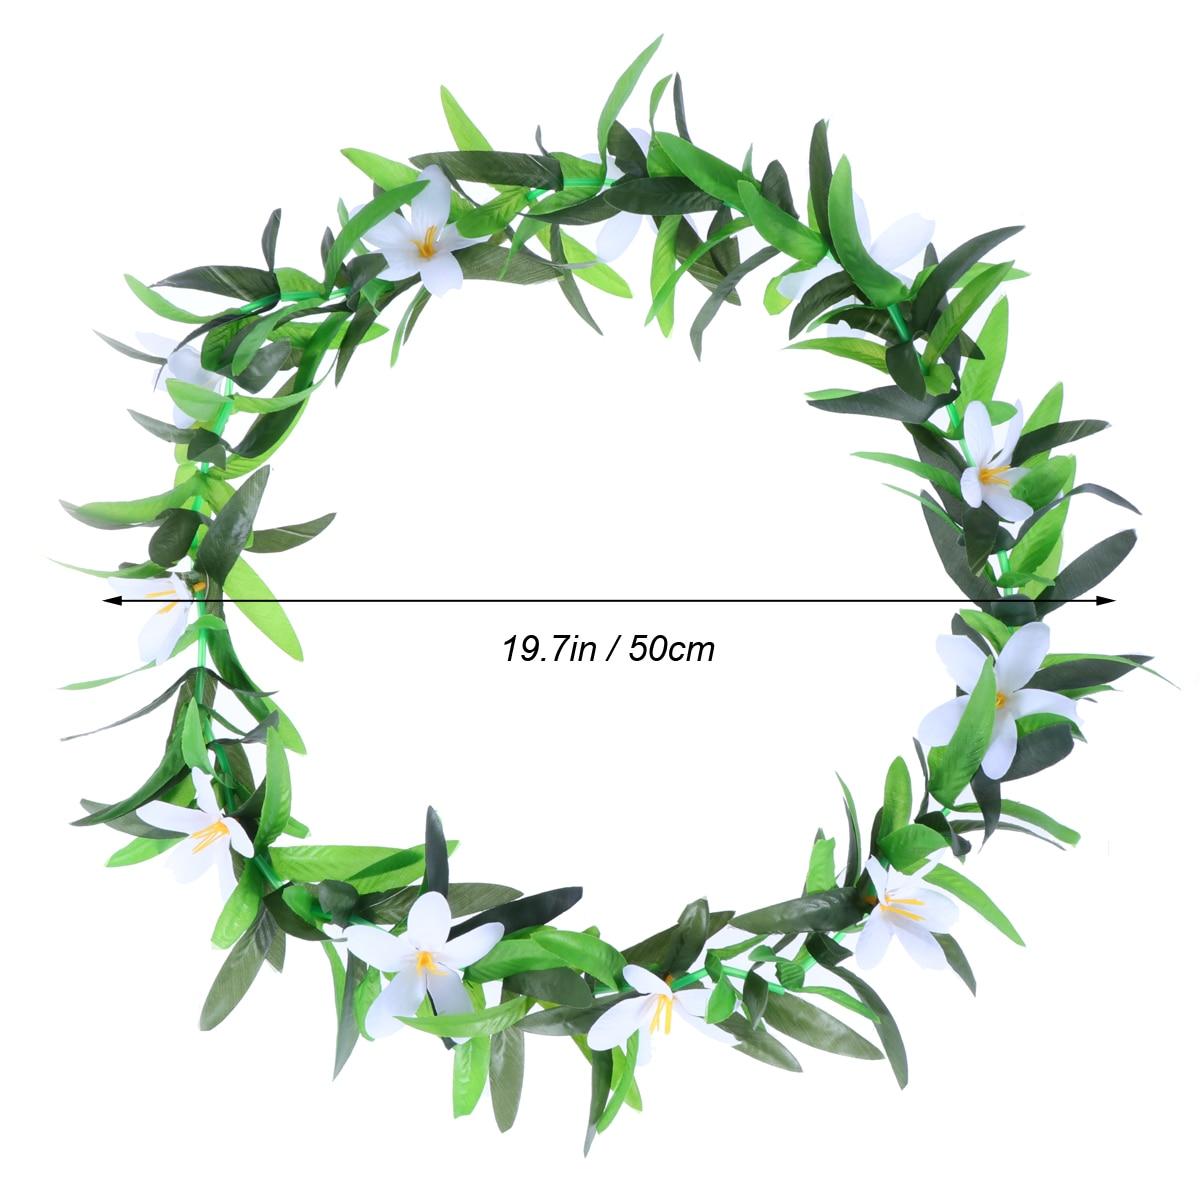 Hawaiian Luau Party Leis Necklace Simulated Summer Flower Wreaths ...